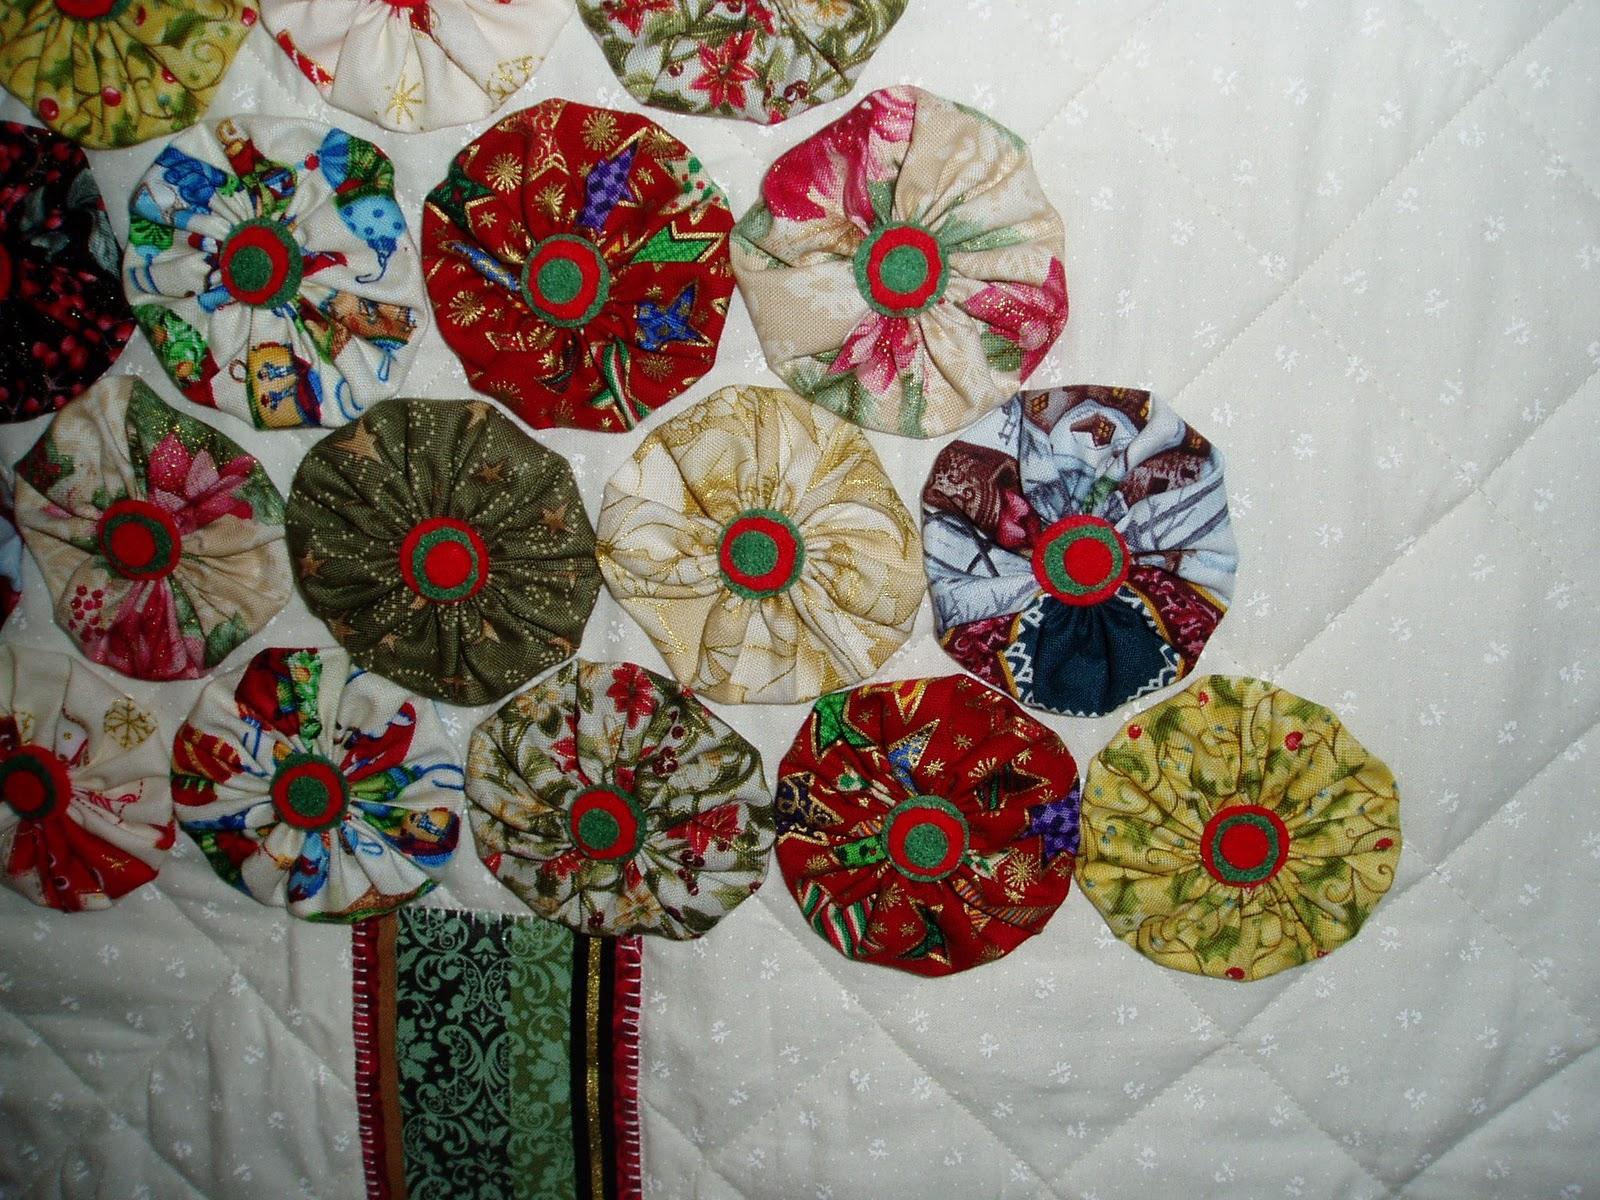 El costurero de teresa panel rbol de navidad - Arbol de navidad de tela ...